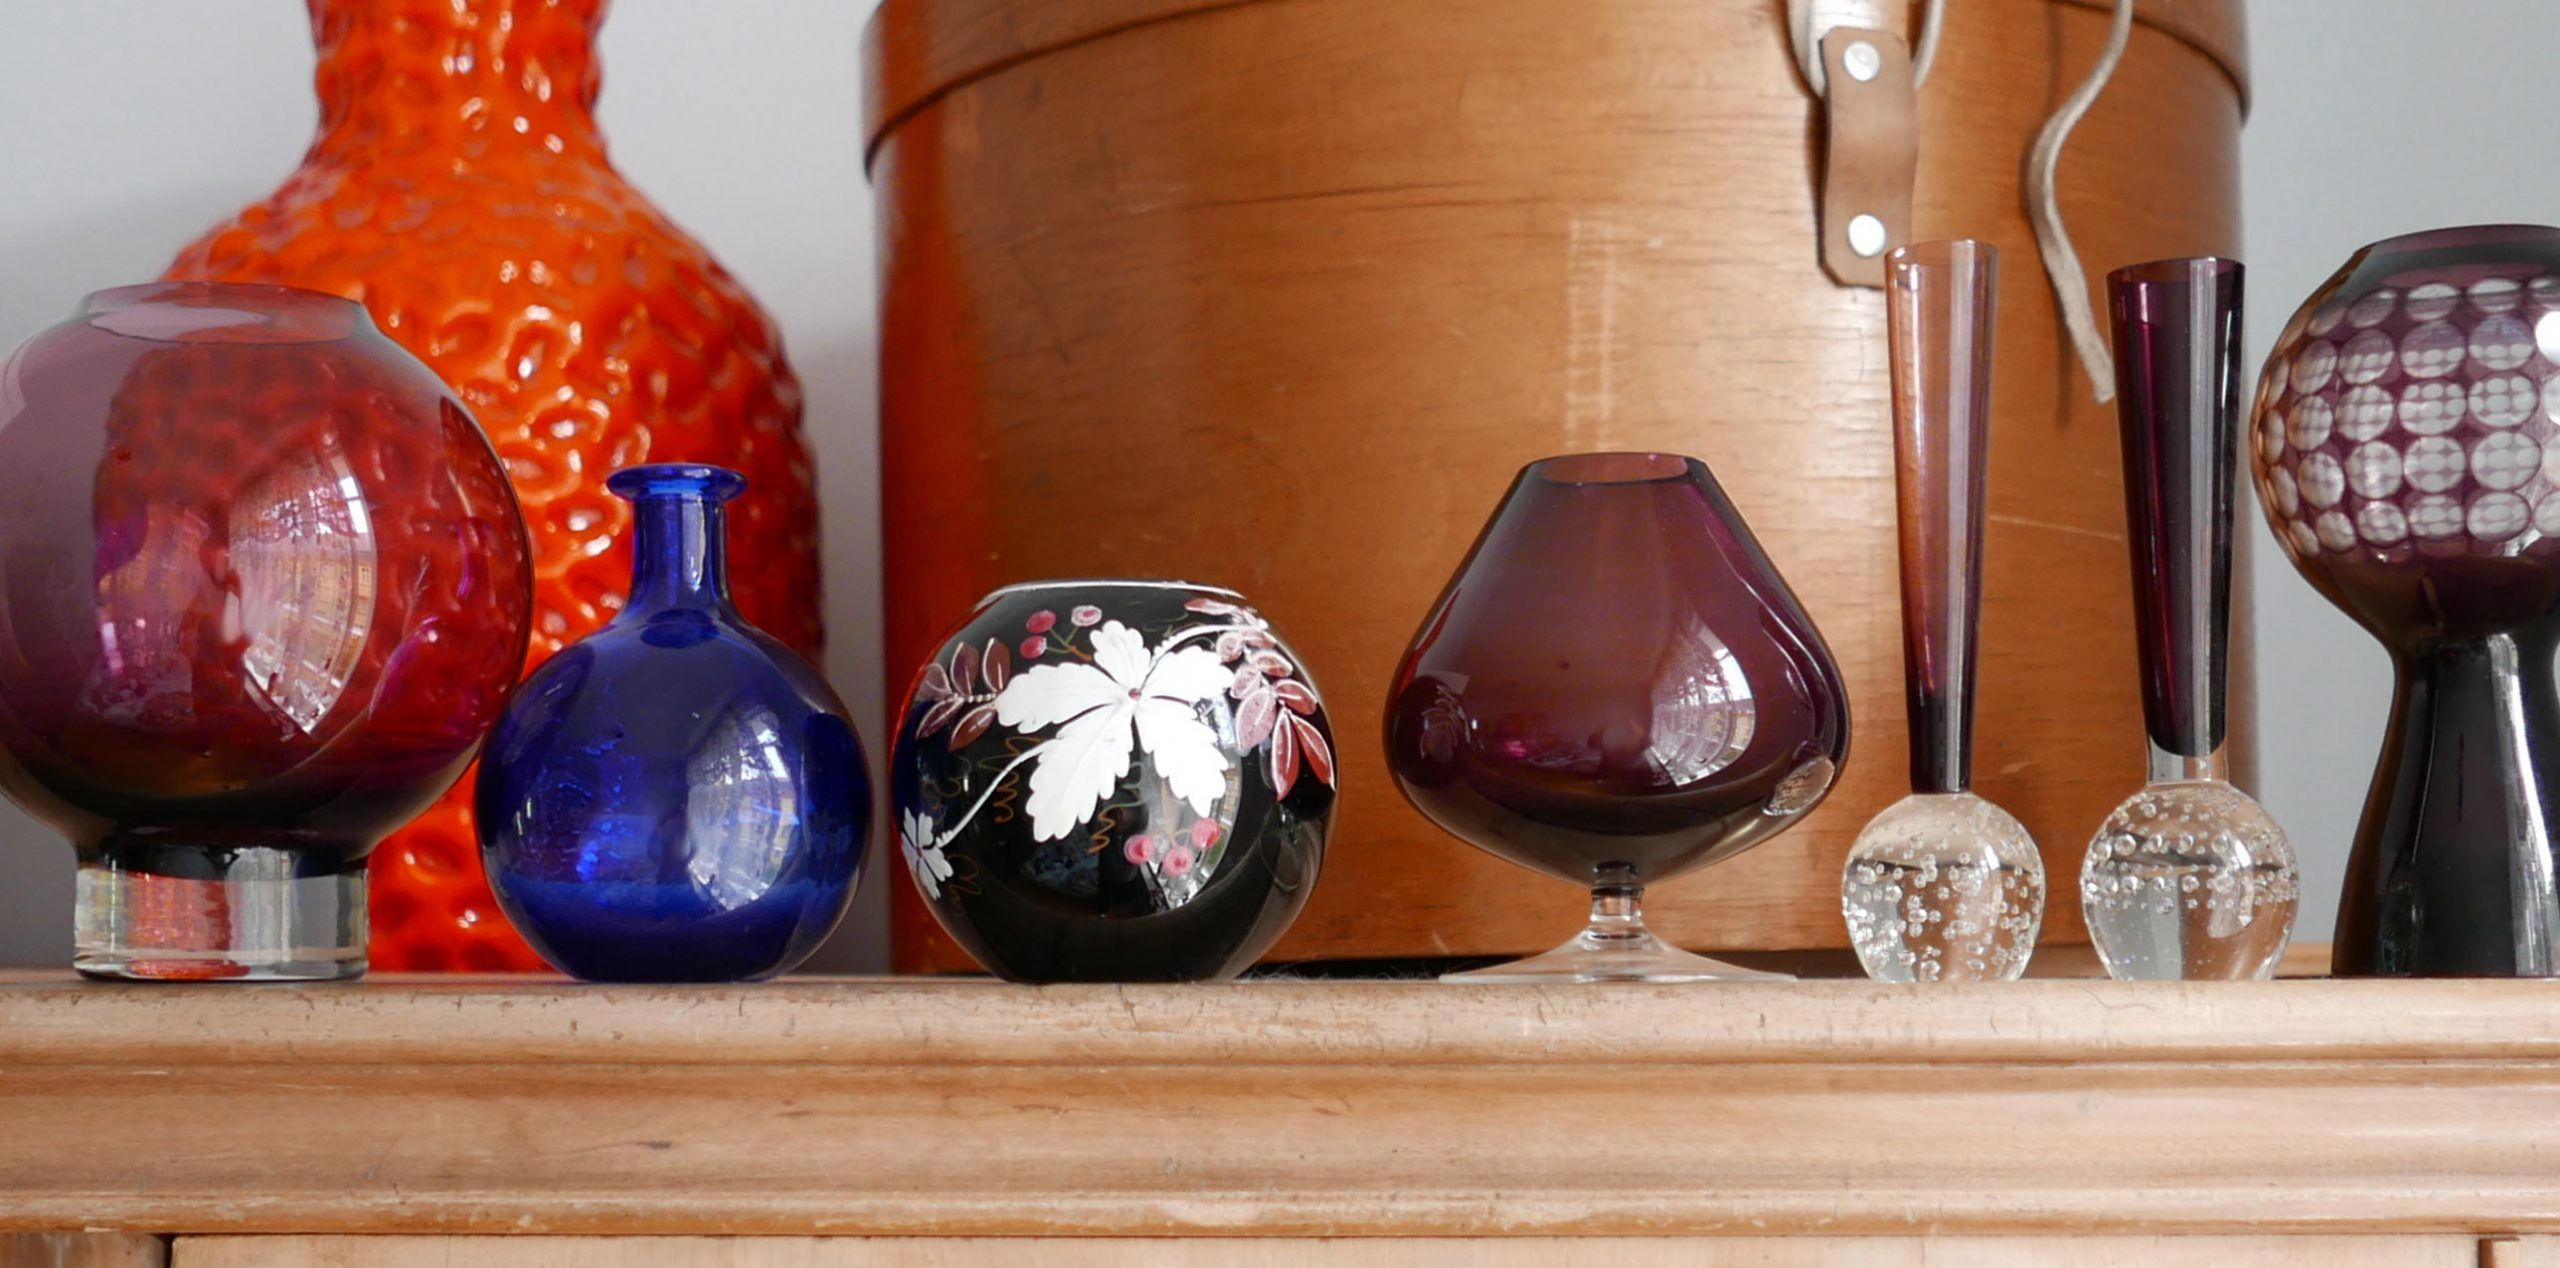 Sammlung violetter Vasen Kugelformen